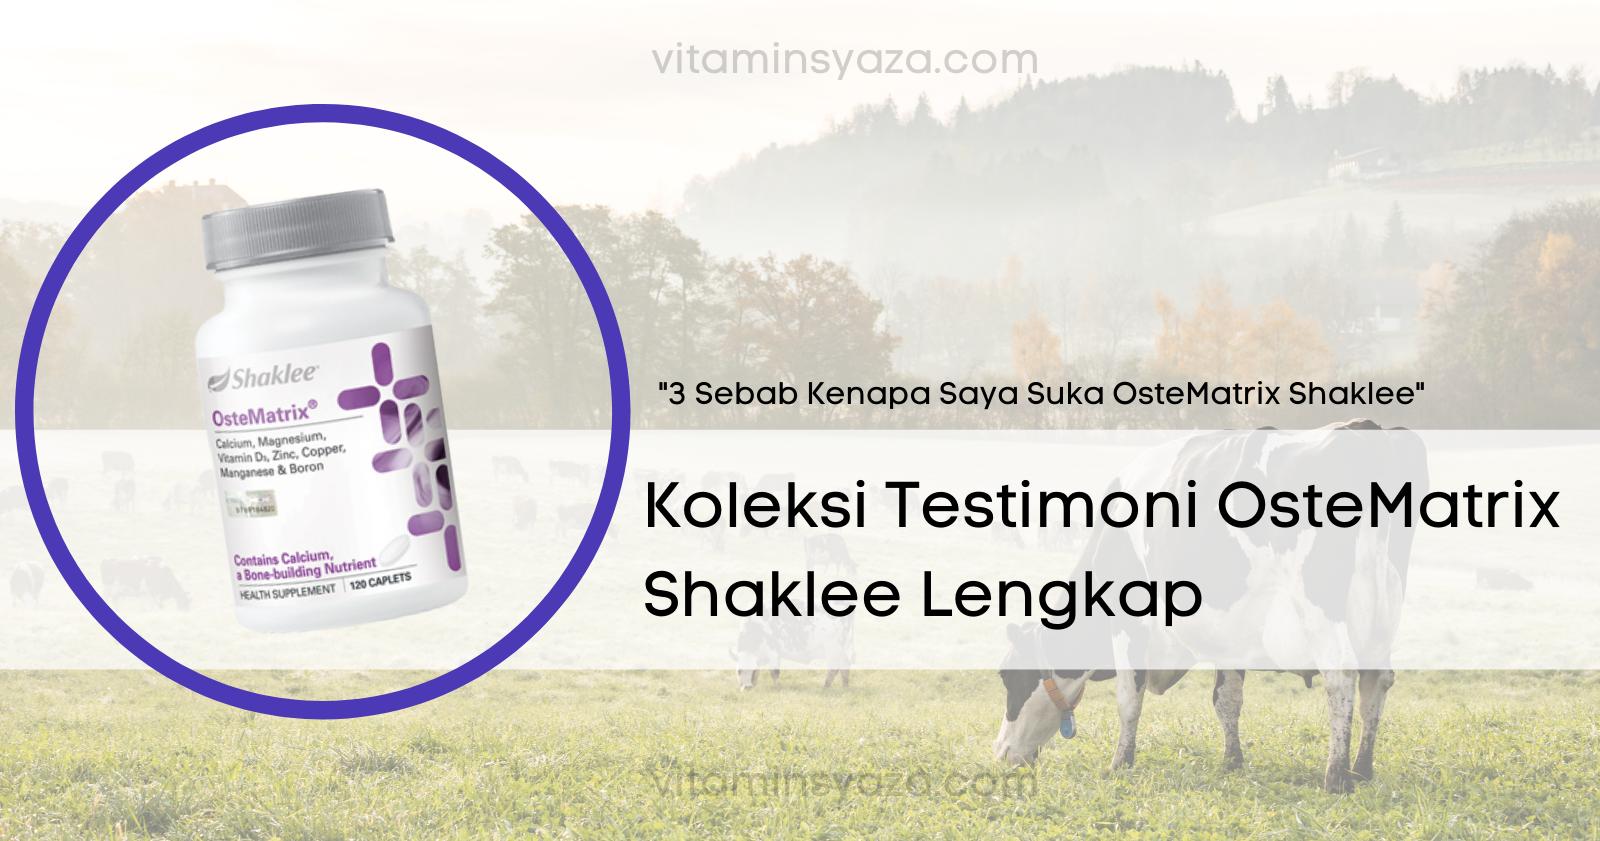 Promosi Shaklee Oktober 2018